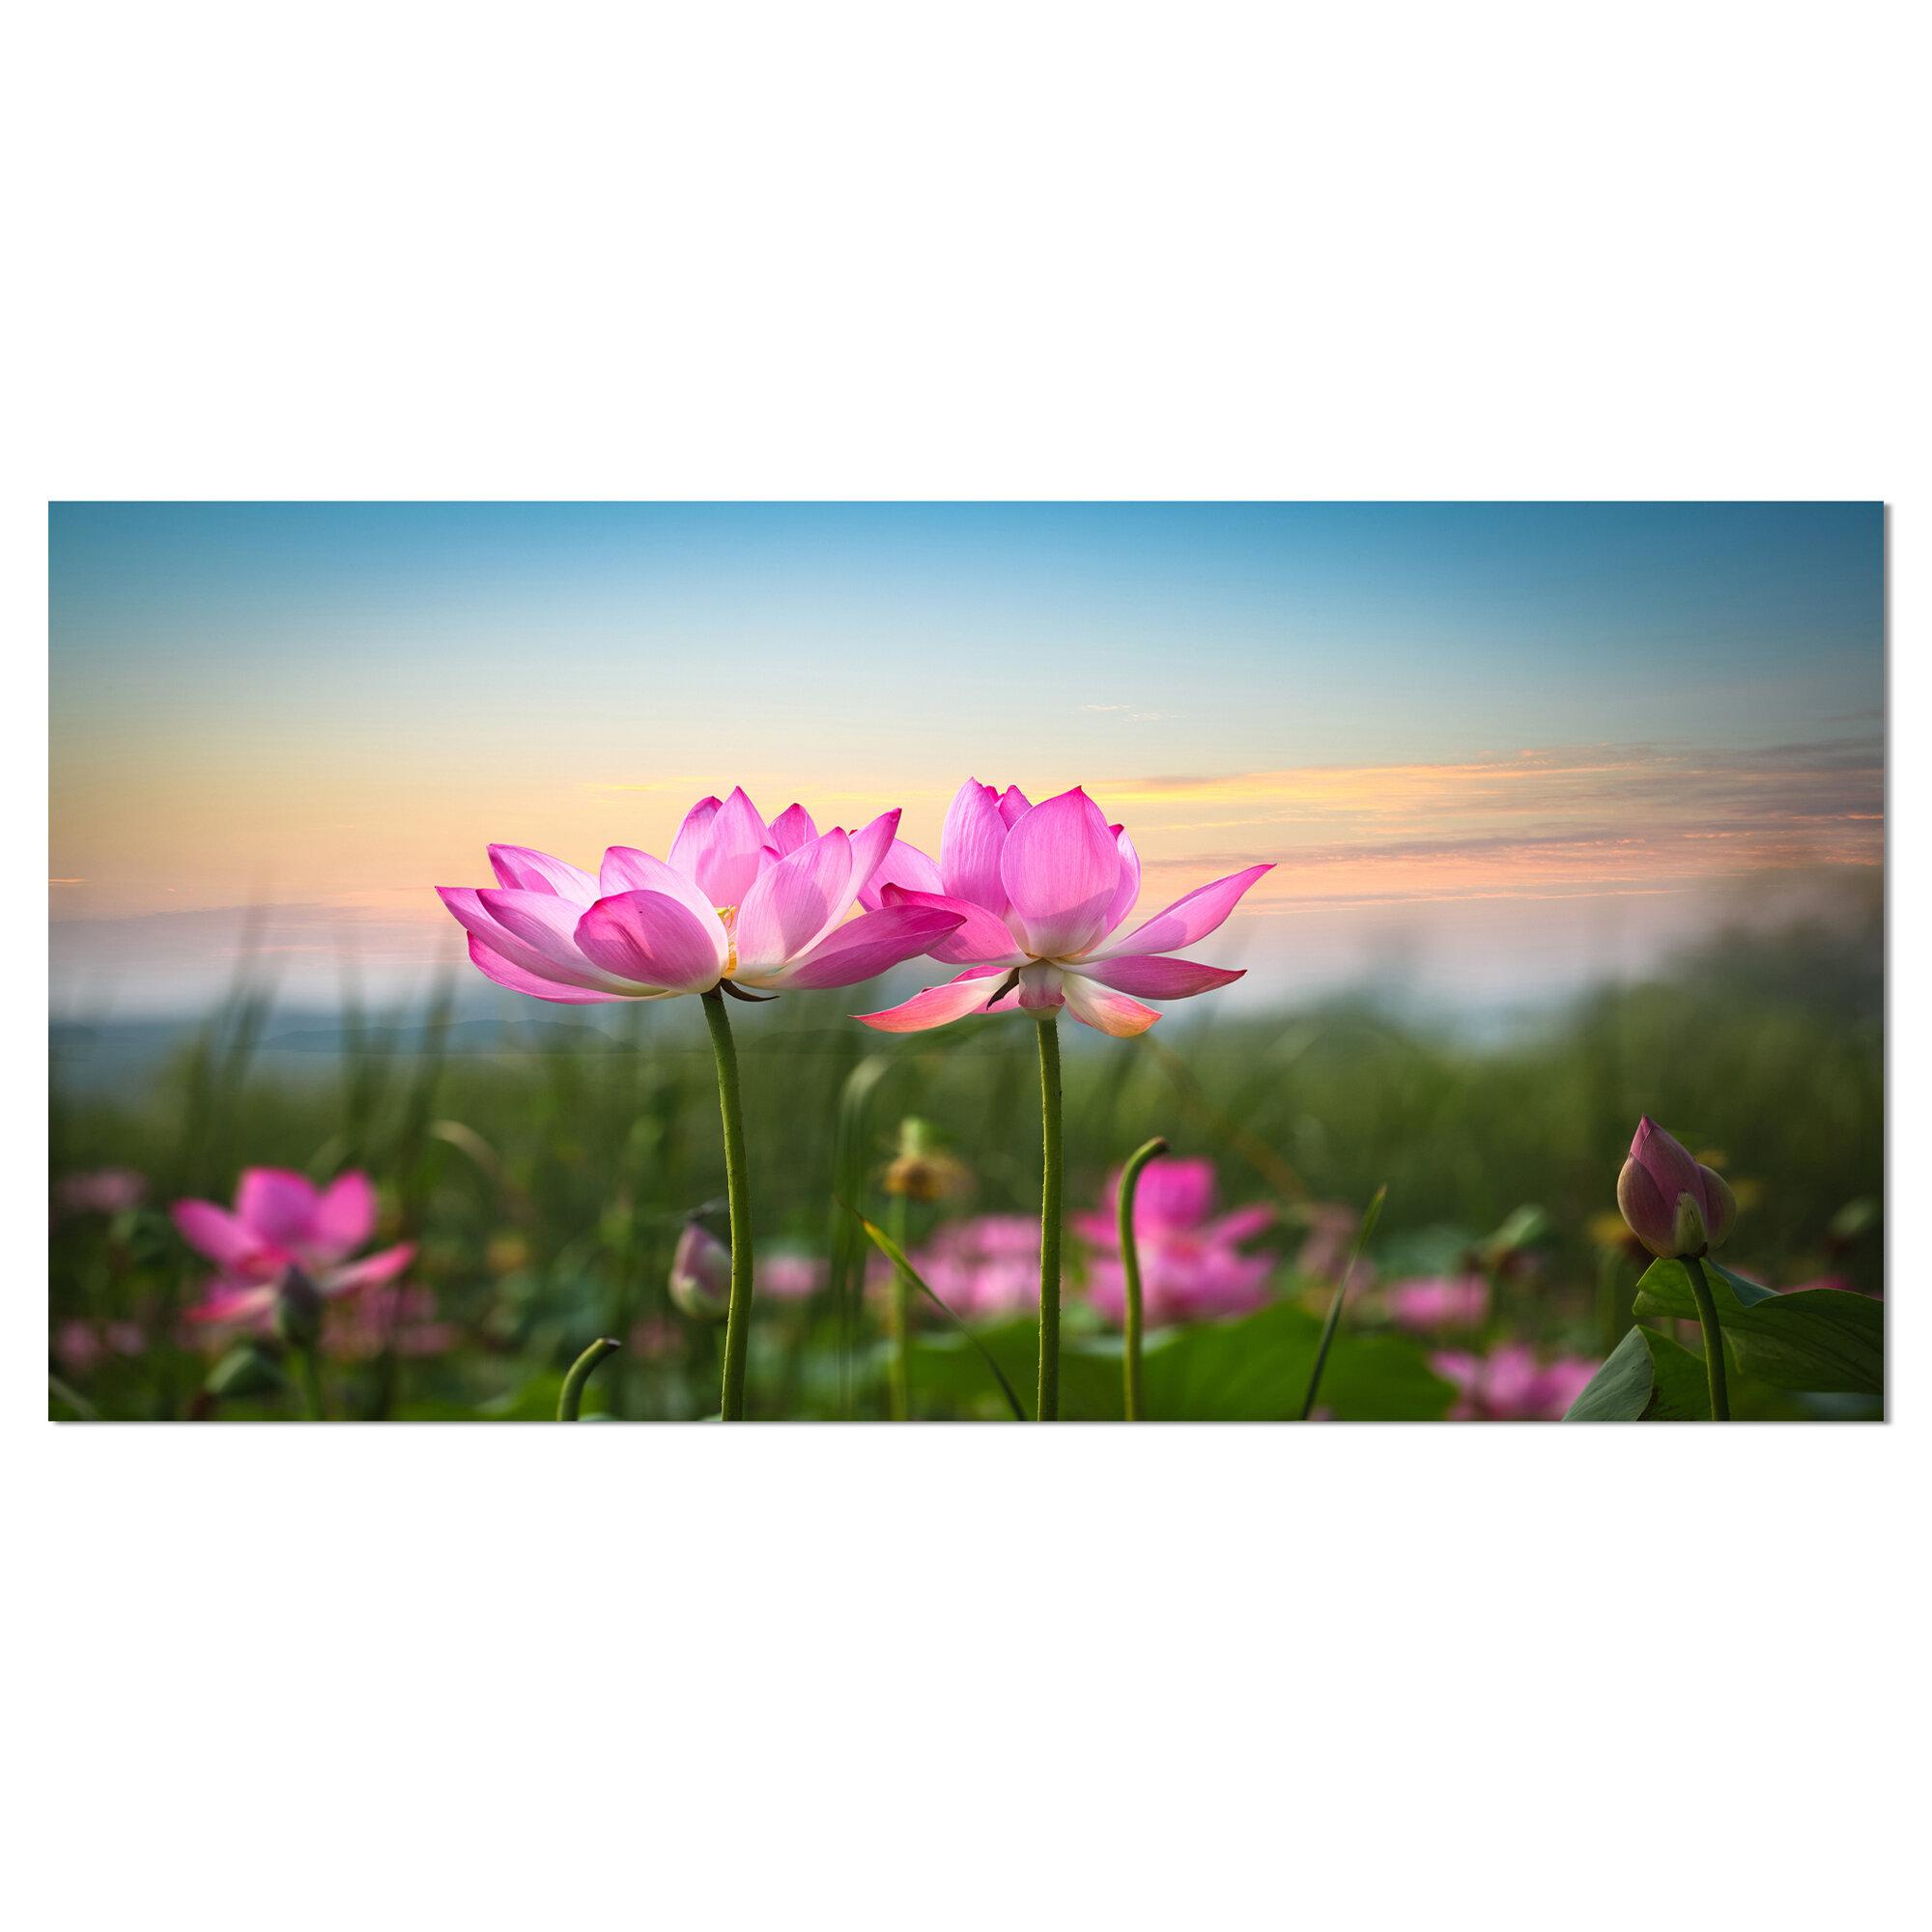 Designart blooming lotus flowers at sunset graphic art on wrapped designart blooming lotus flowers at sunset graphic art on wrapped canvas wayfair izmirmasajfo